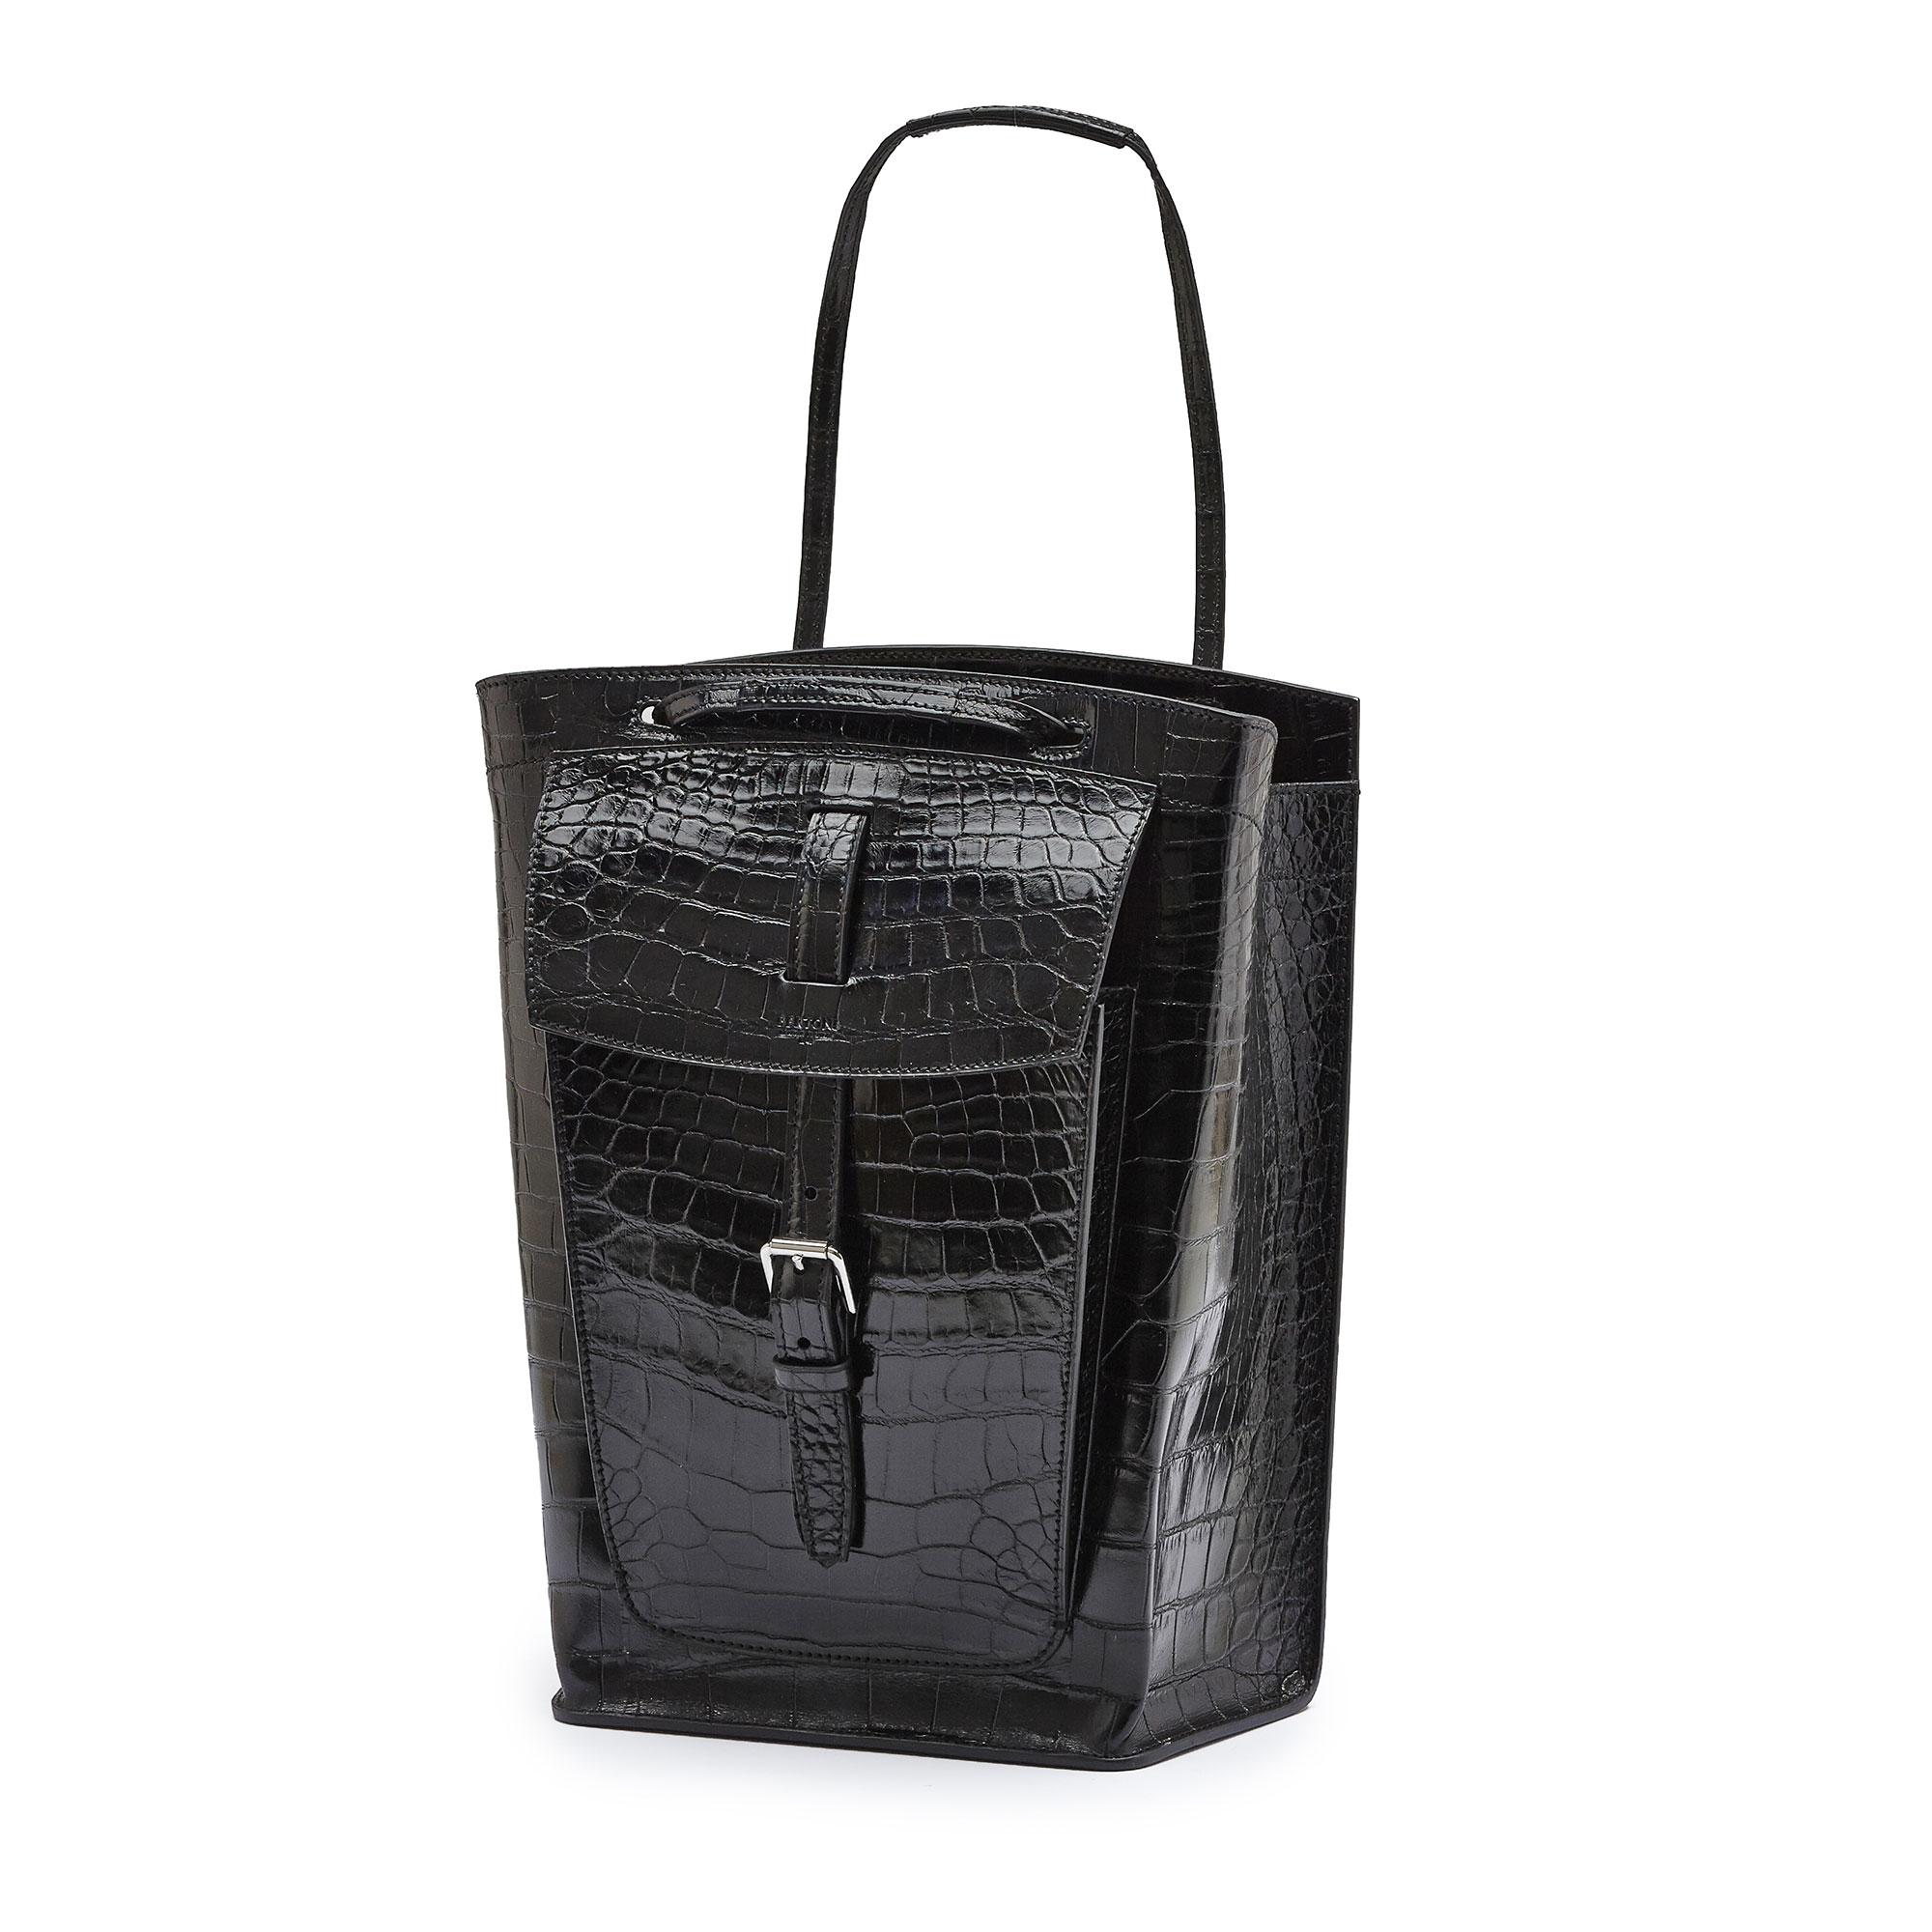 The black alligator Arizona bucket bag by Bertoni 1949 02